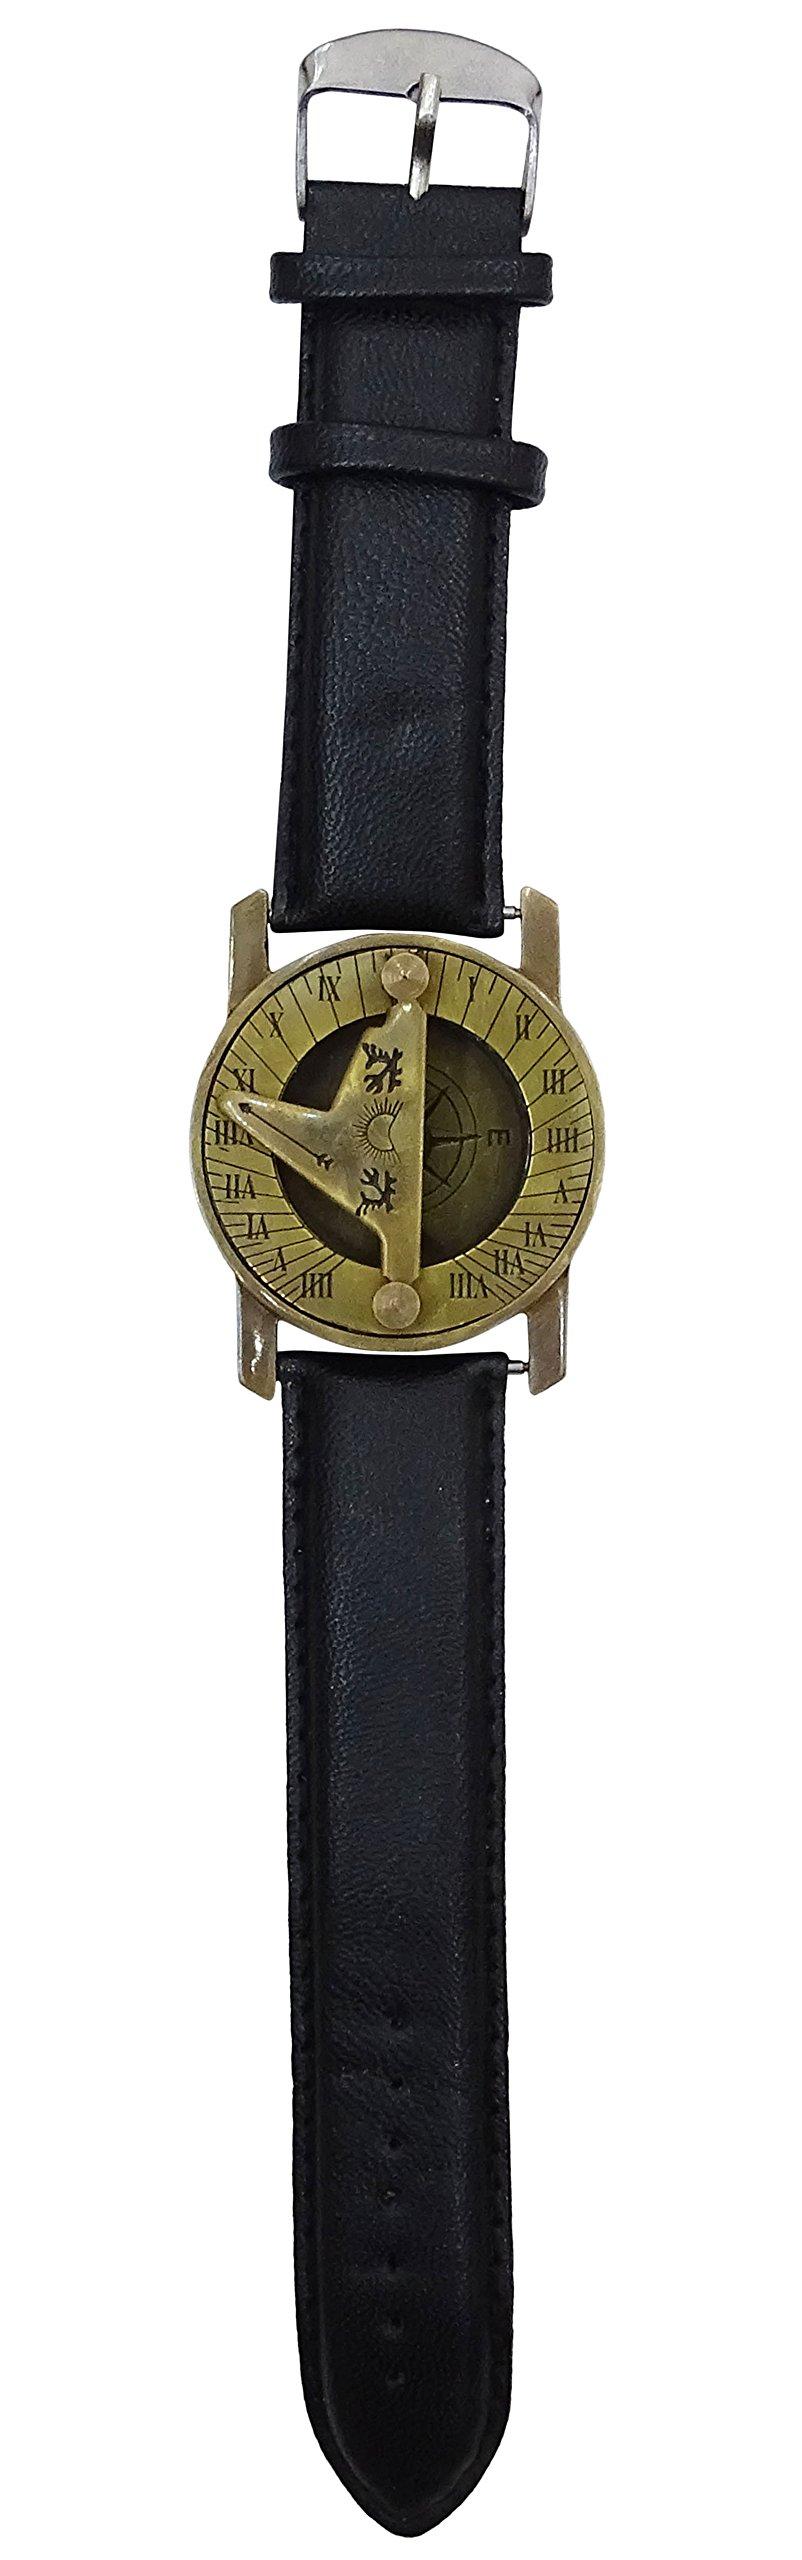 Brass Compass Wrist Nautical Magnetic Navigation Sundial Maritime Hiking Travel